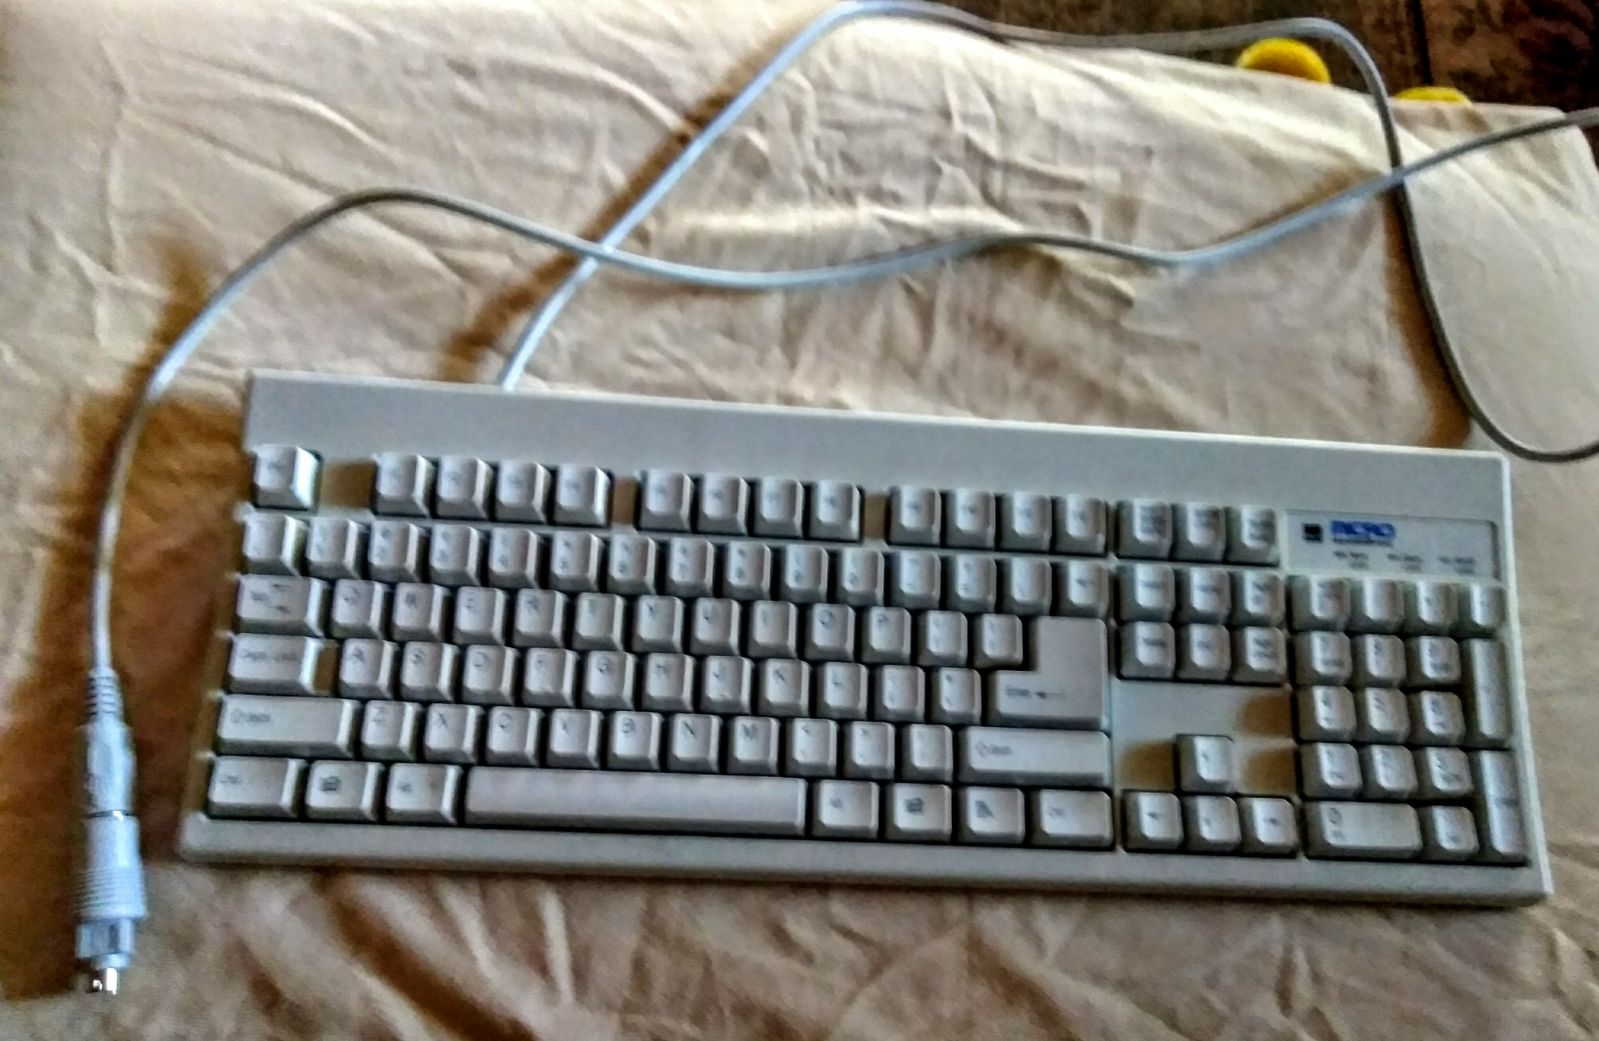 Micro innovations keyboard computer